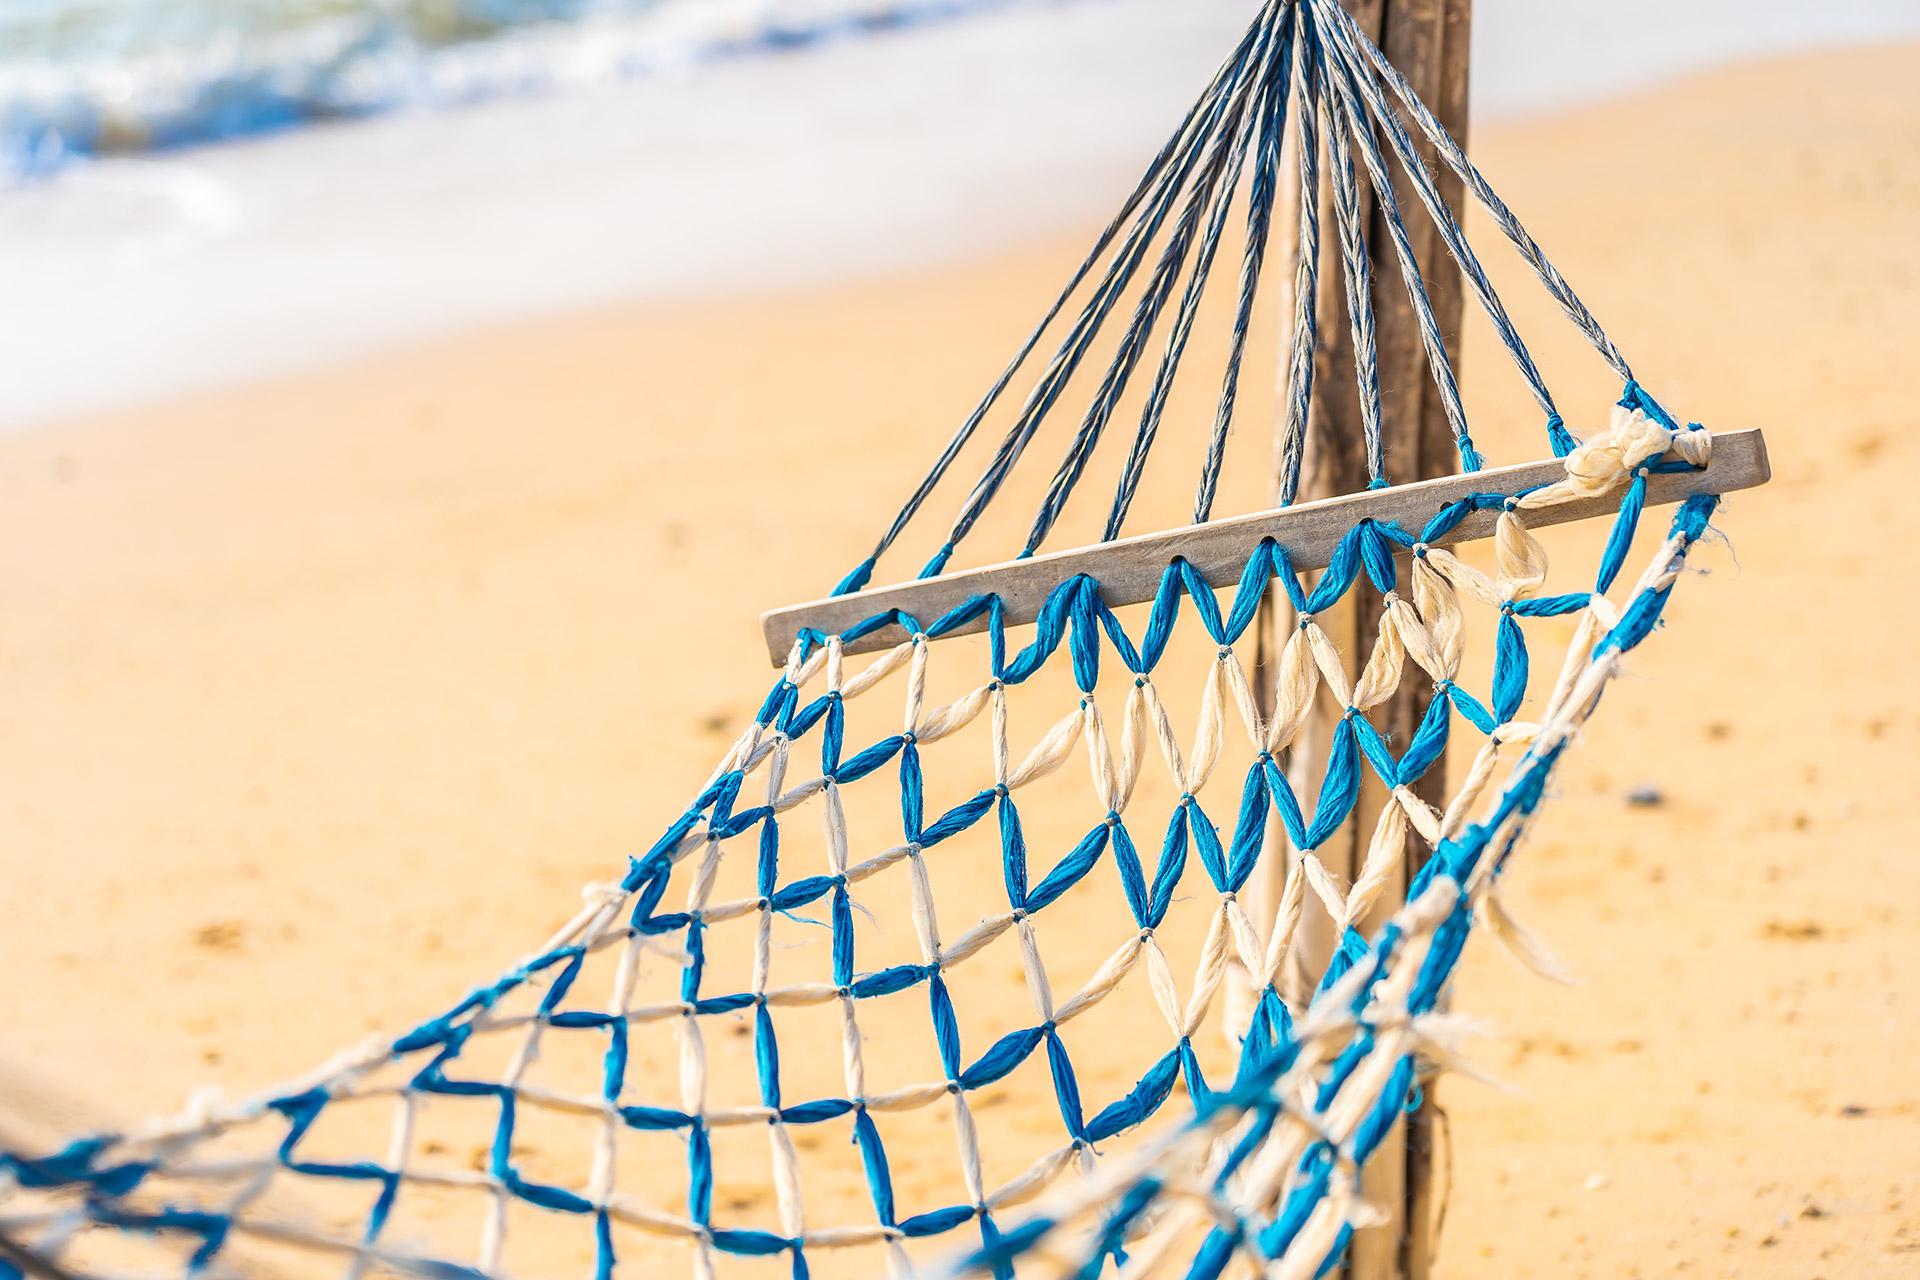 MAI- Wochenende am Strand